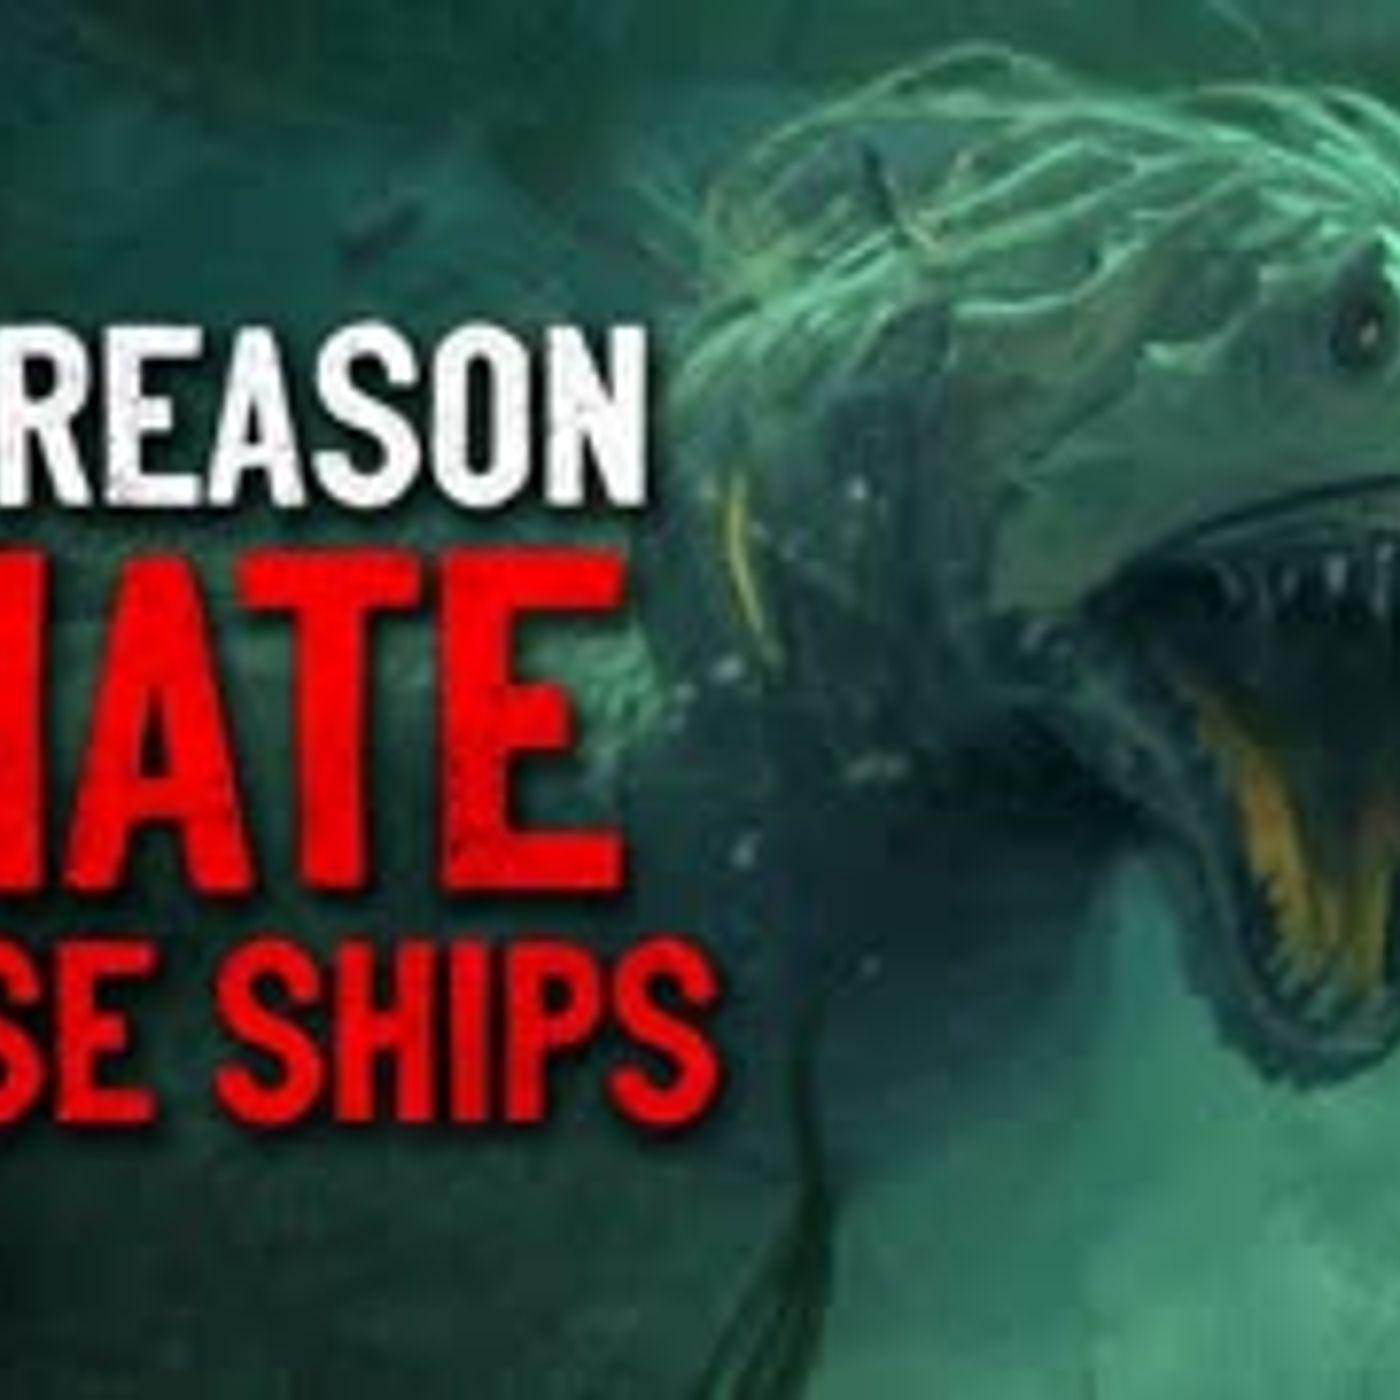 """The Reason I Hate Cruise Ships"" Creepypasta"